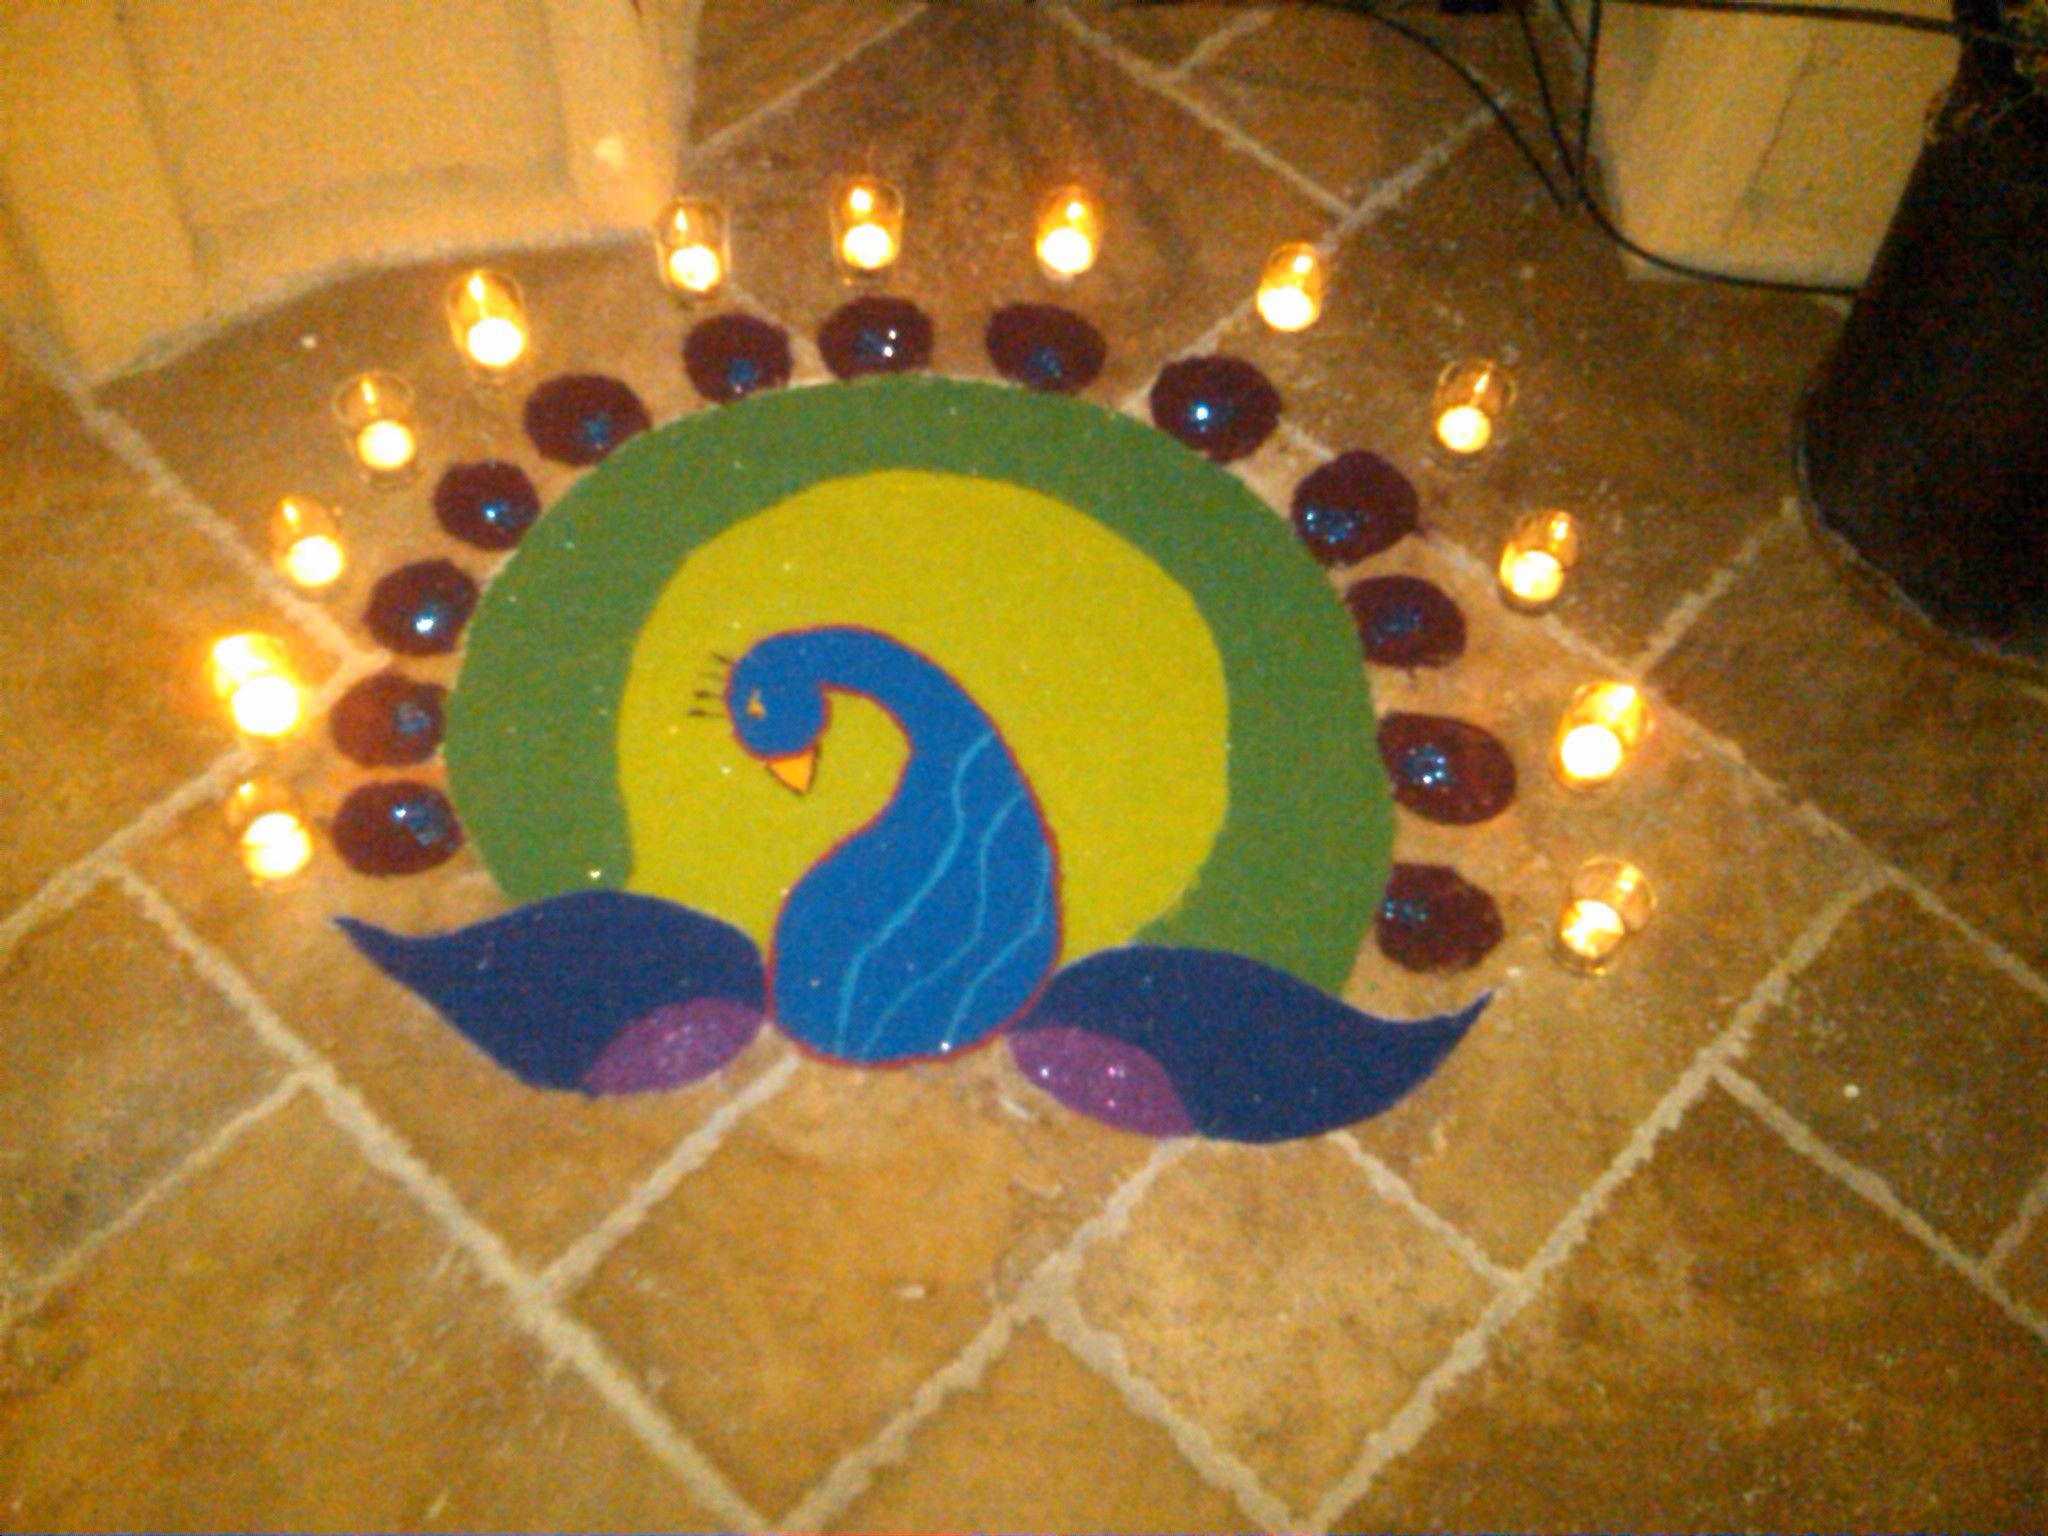 Rangoli for Diwali 2011 that I made o) Paisley love